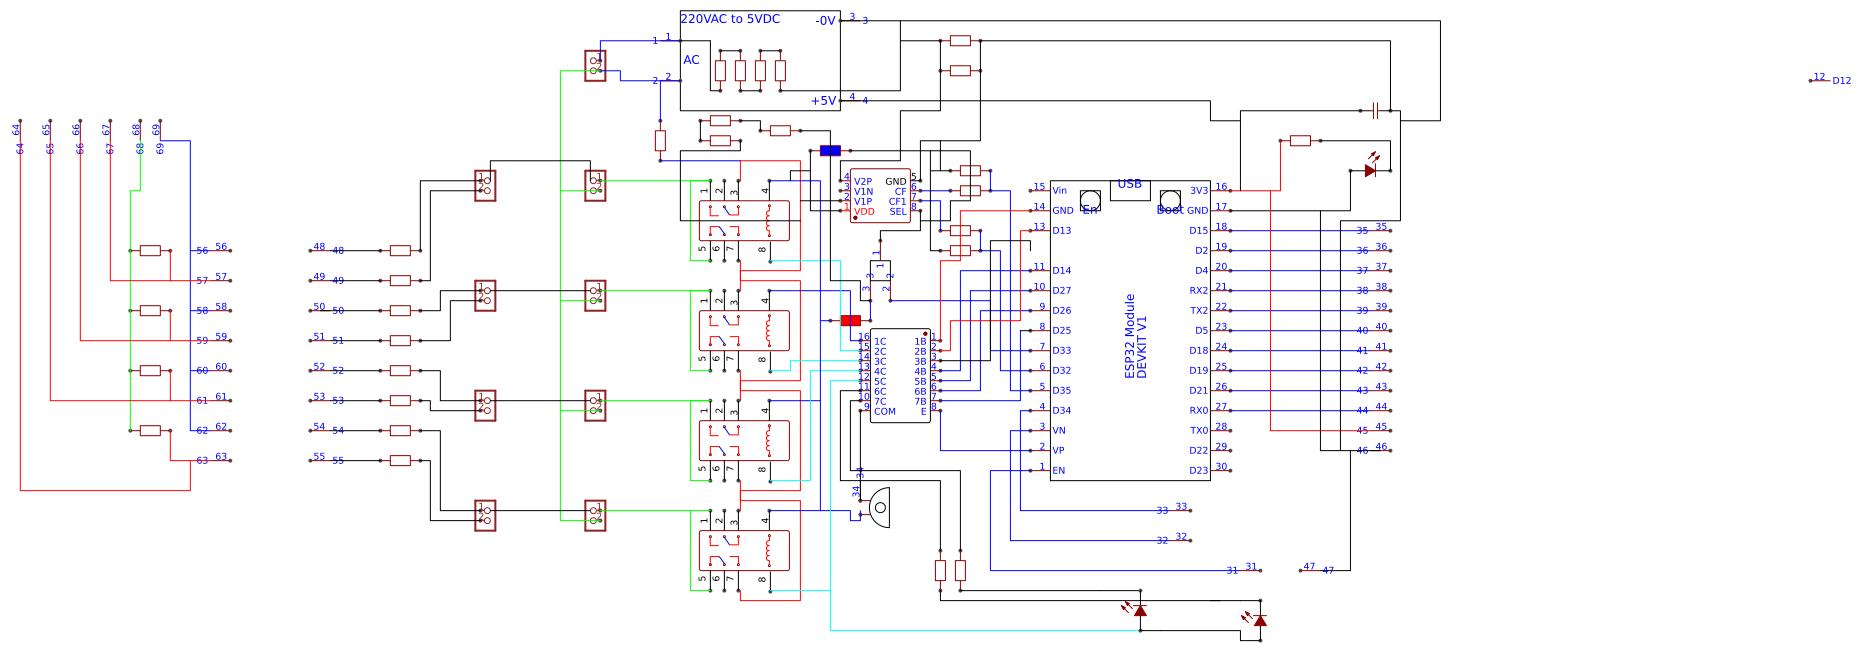 esp32 module - Search - EasyEDA